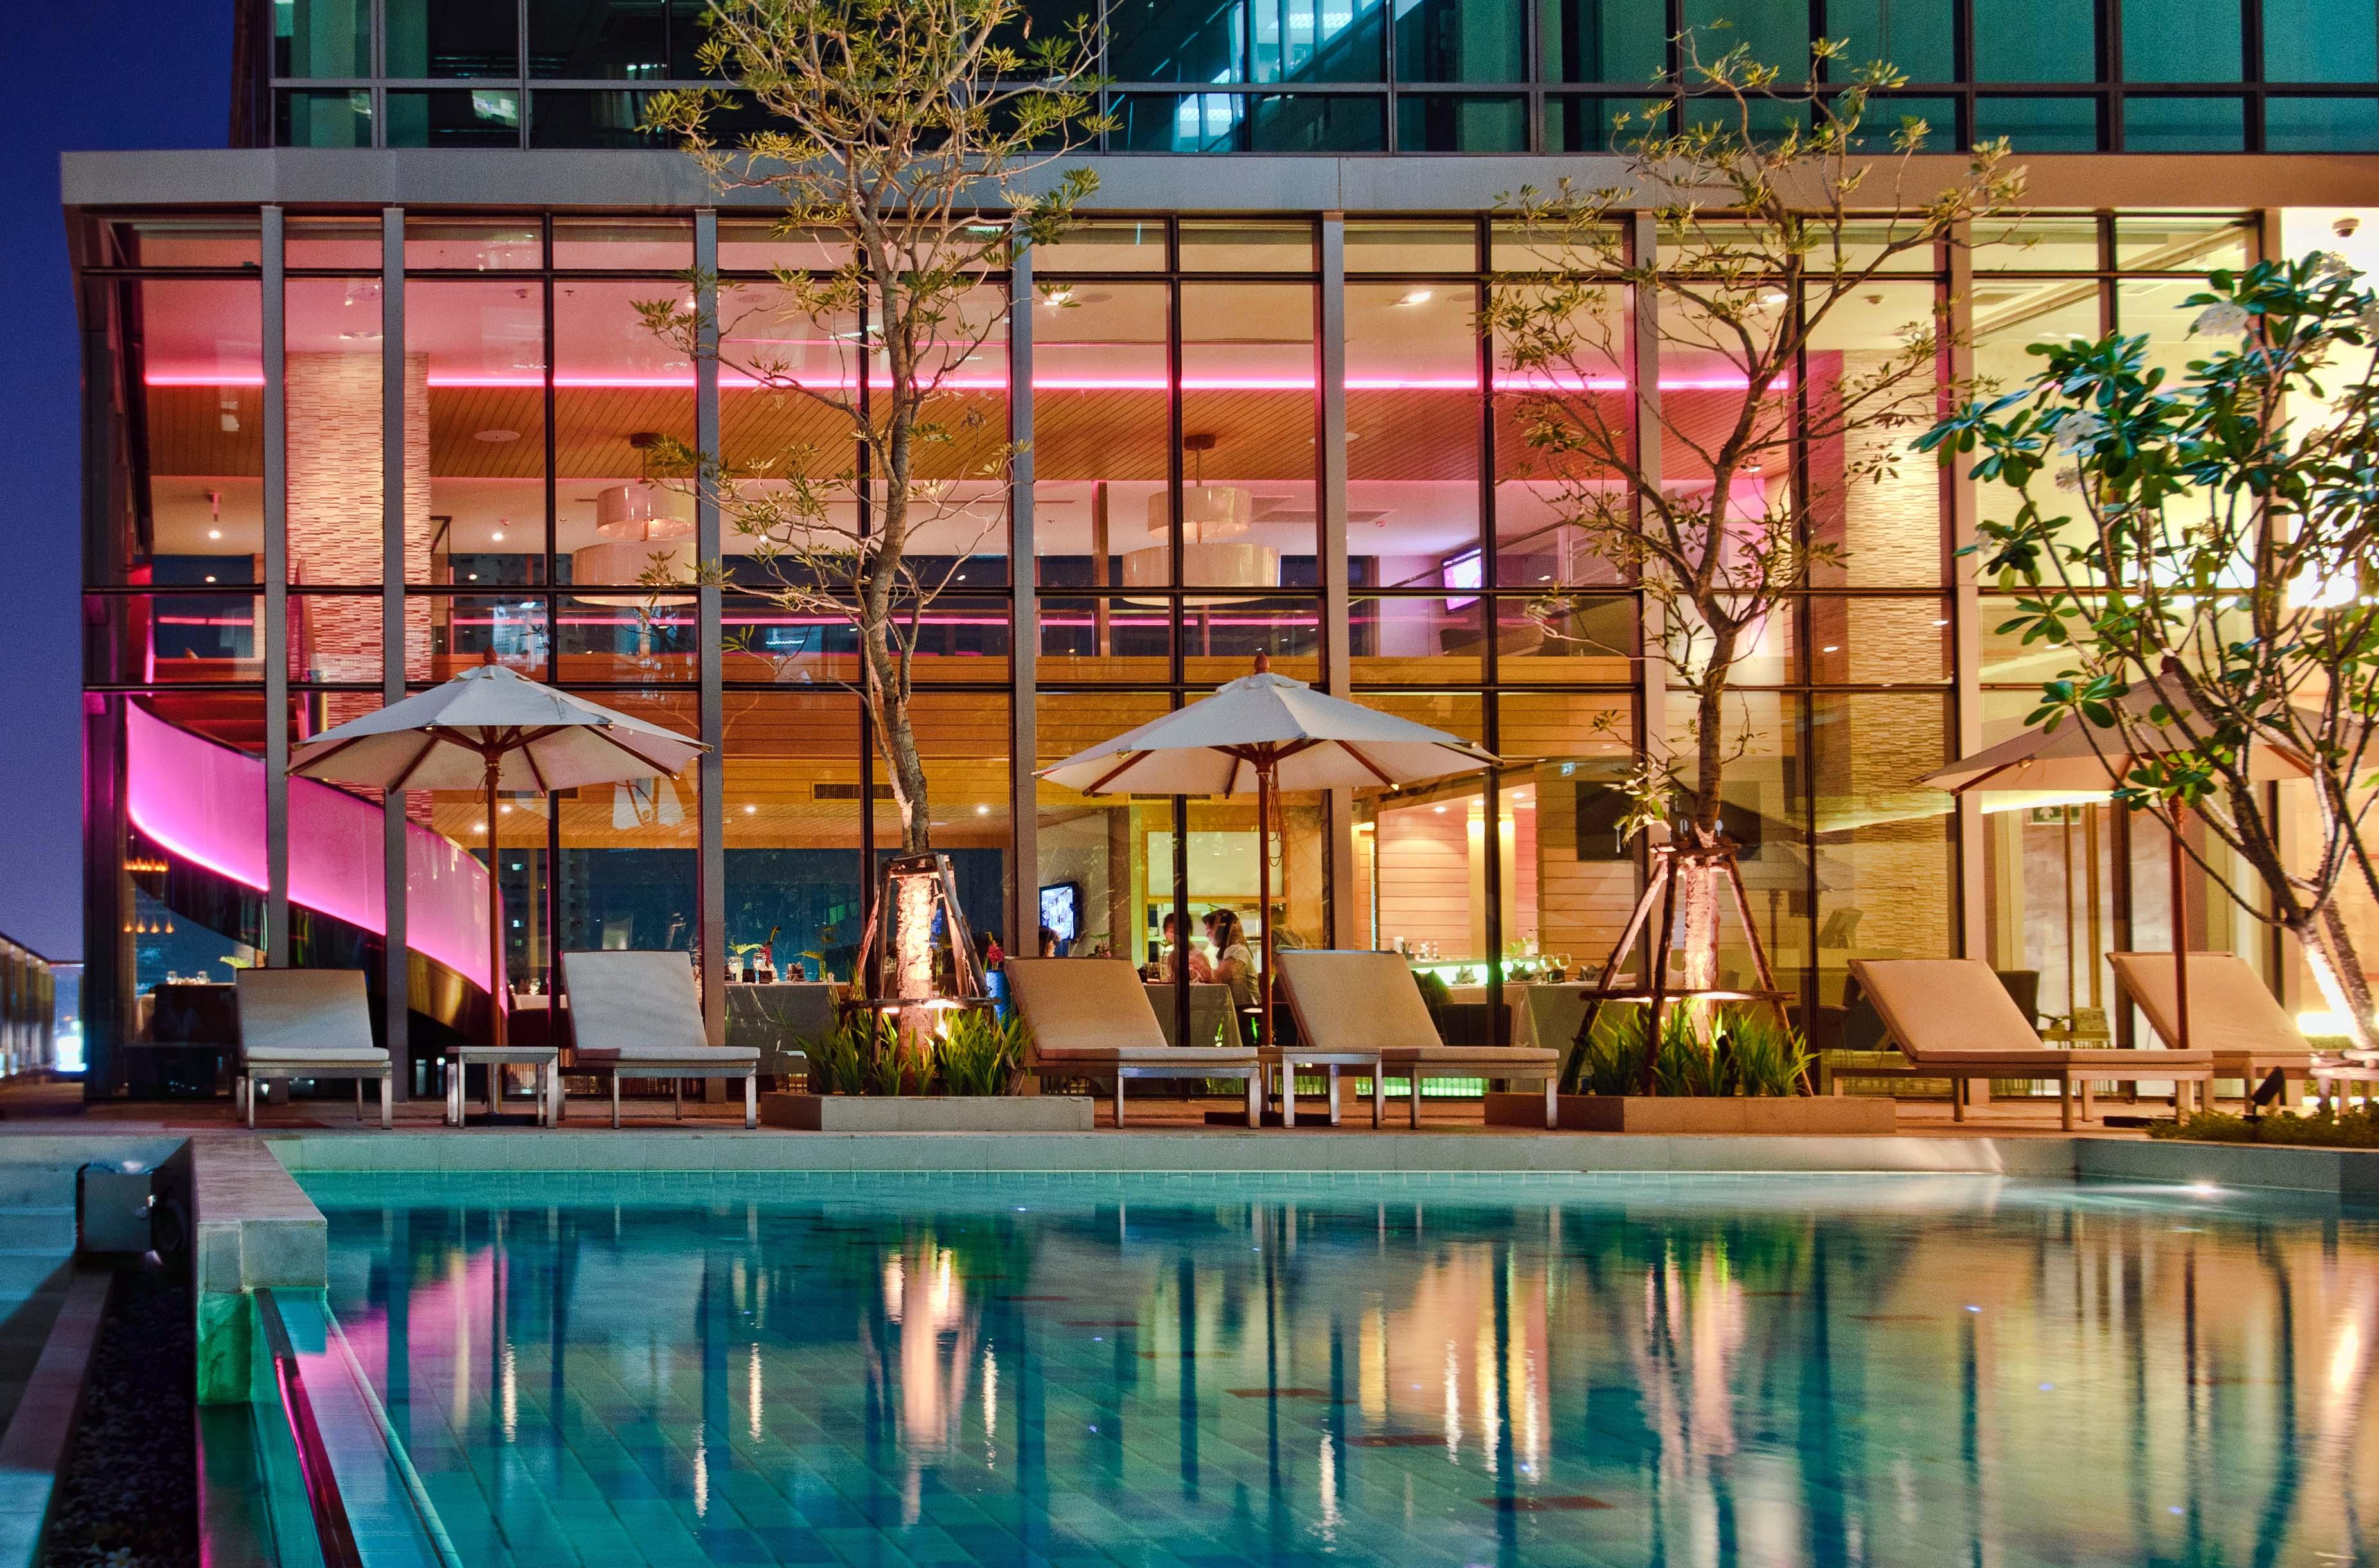 Picture of hotel indigo bangkok wireless road bangkok tripadvisor - Read Reviews Of Sivatel Bangkok The Porch